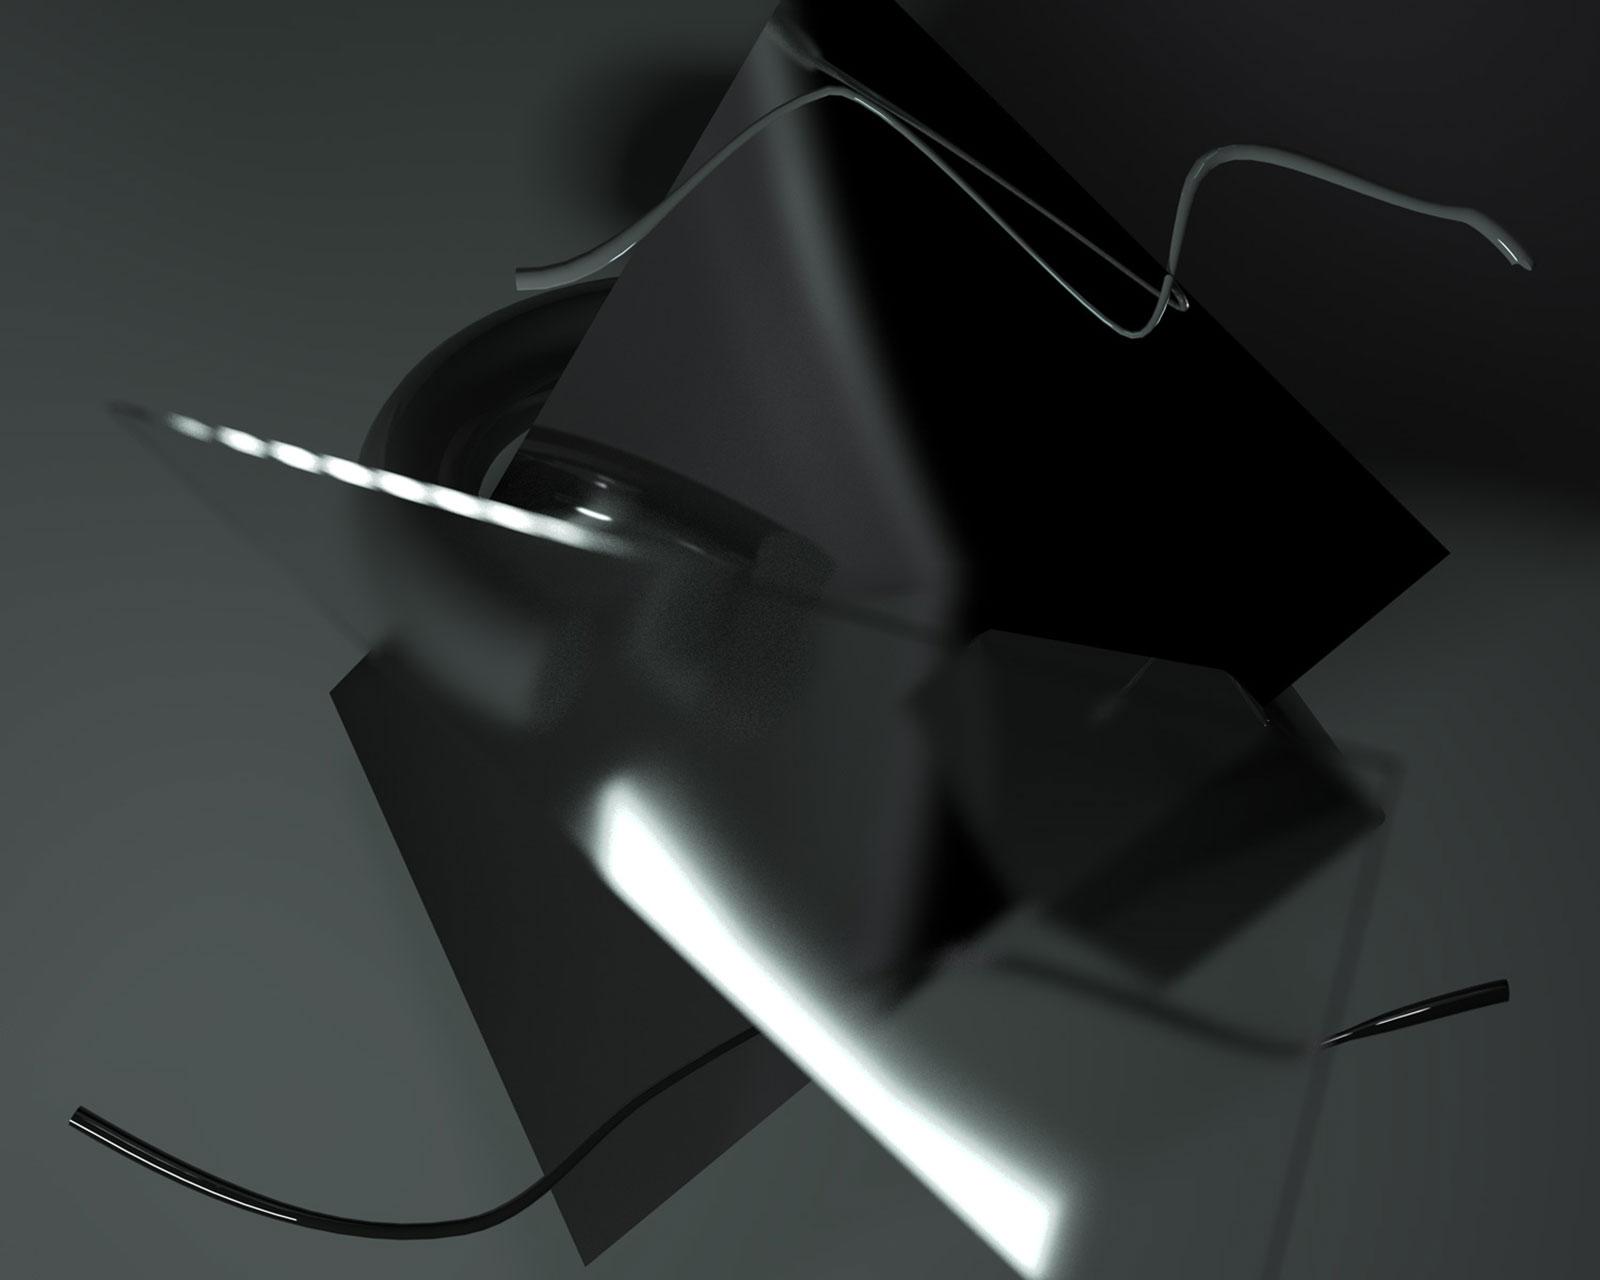 Composition II 03, CGI Fine Art Print, 50 x 62 cm, 2012